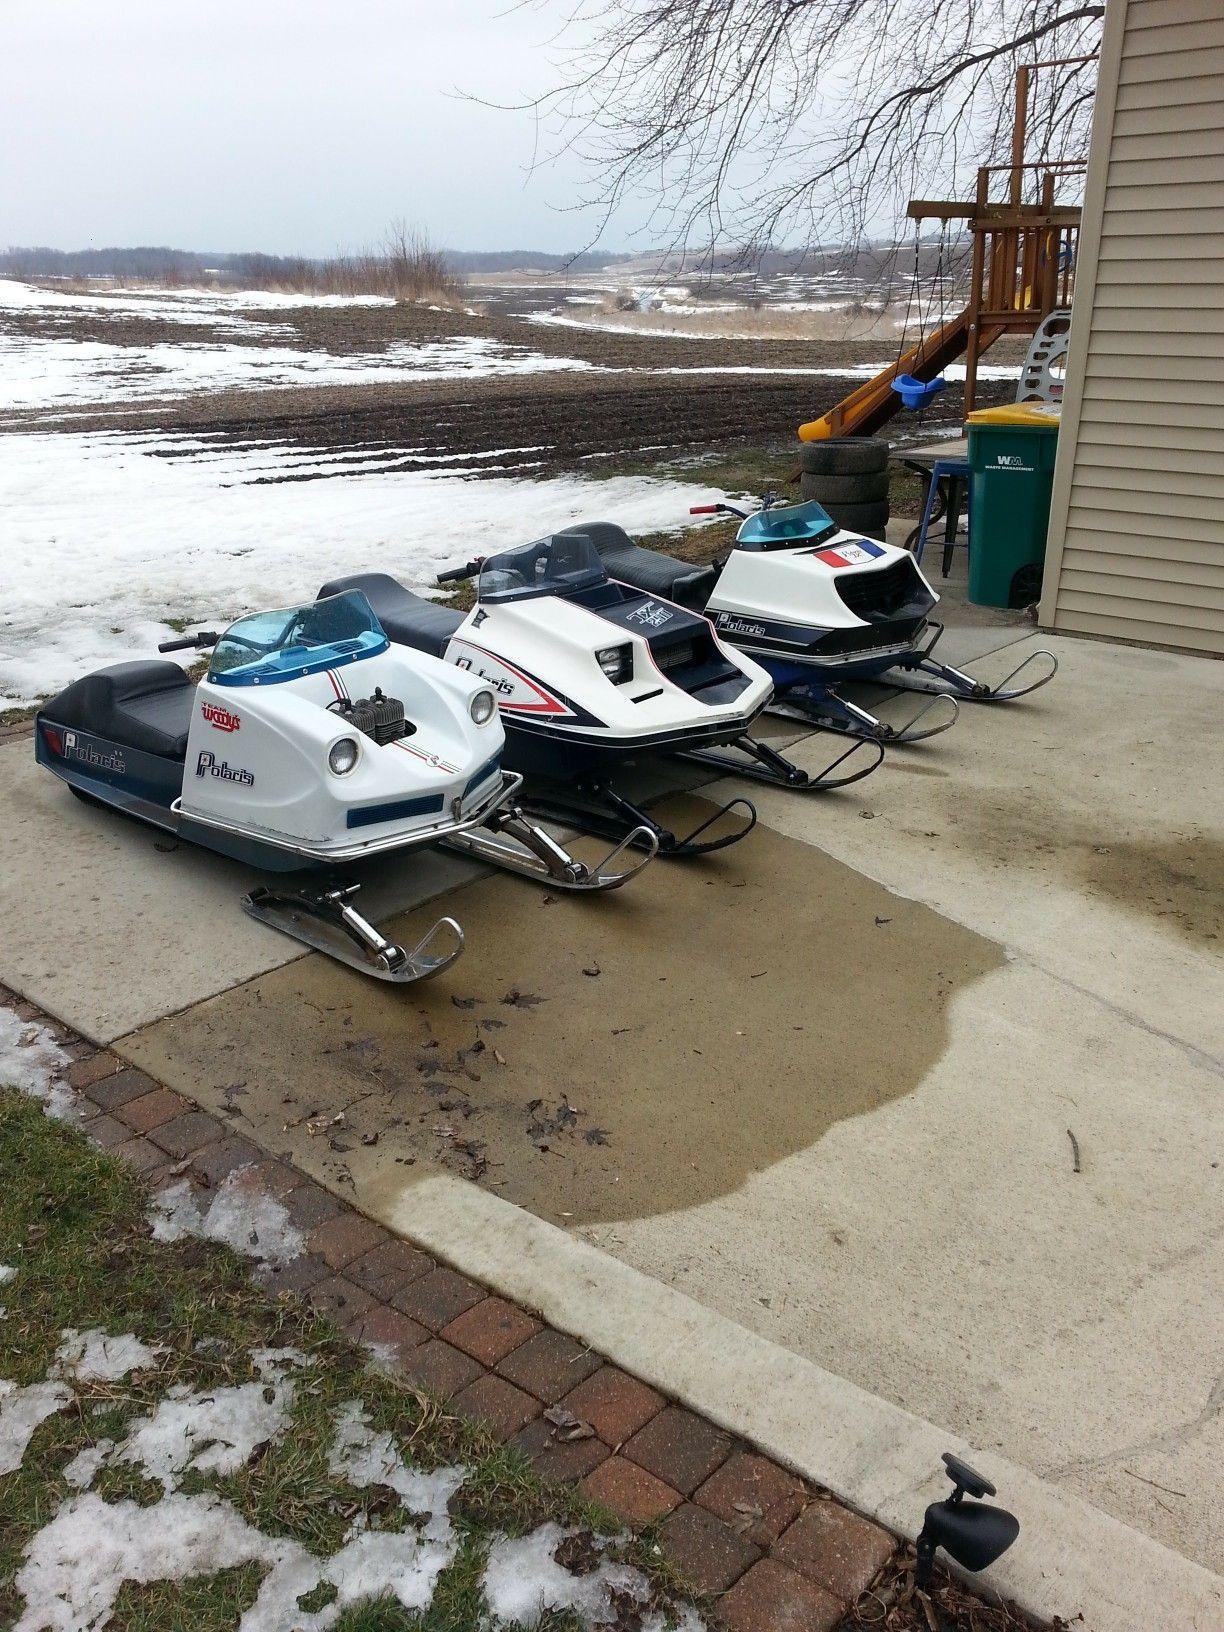 72 colt 340ss 76 tx 250 73 tx 340 vintage sled snowmobiles  [ 1224 x 1632 Pixel ]